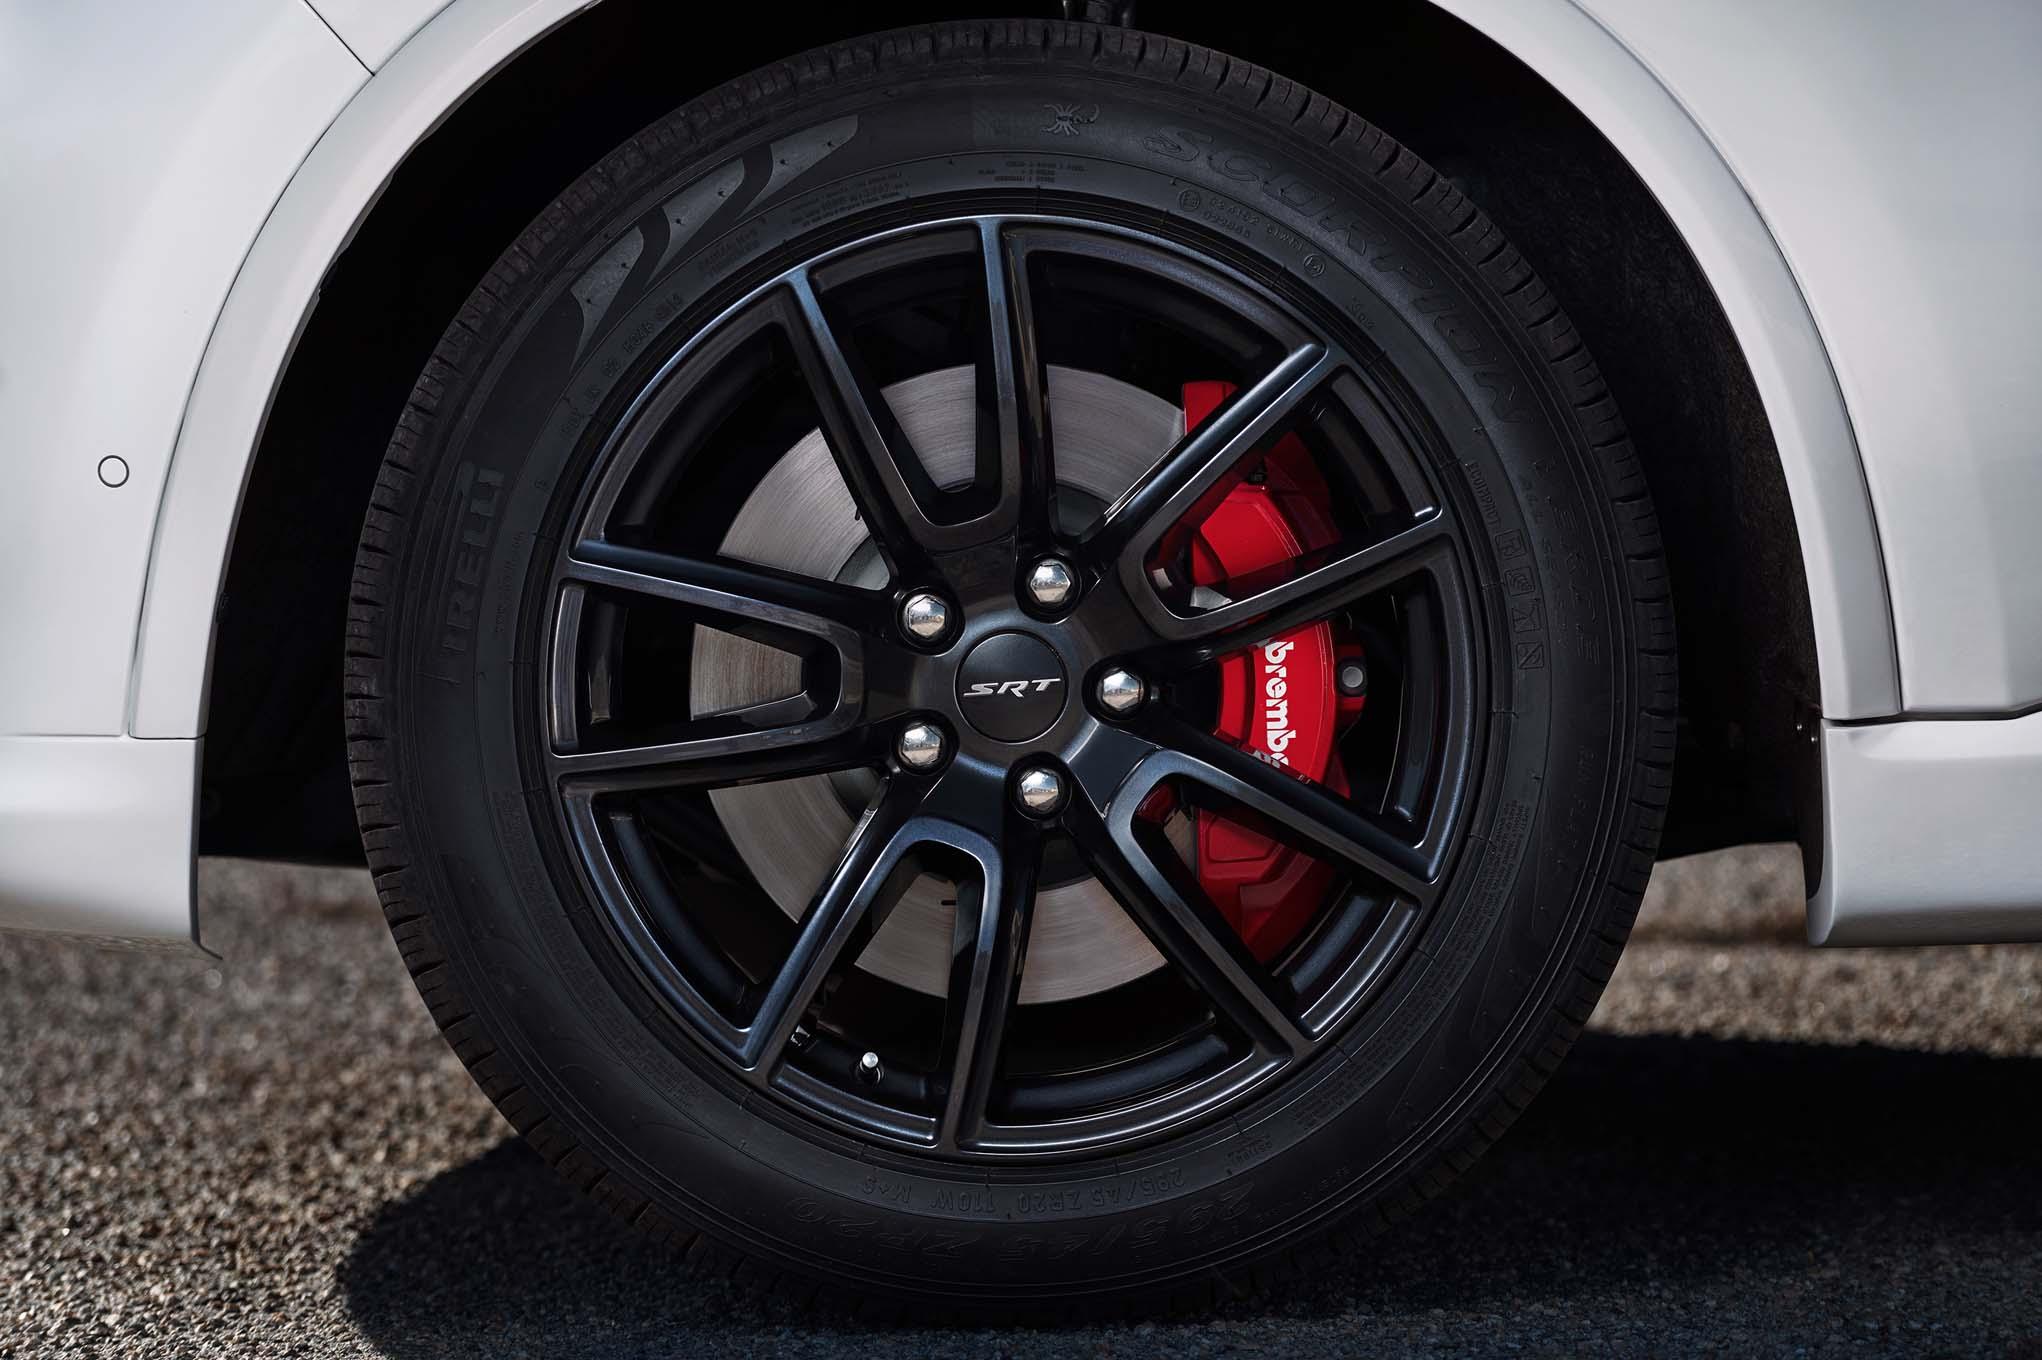 2018 Dodge Durango >> 2018 Dodge Durango SRT First Look | Automobile Magazine